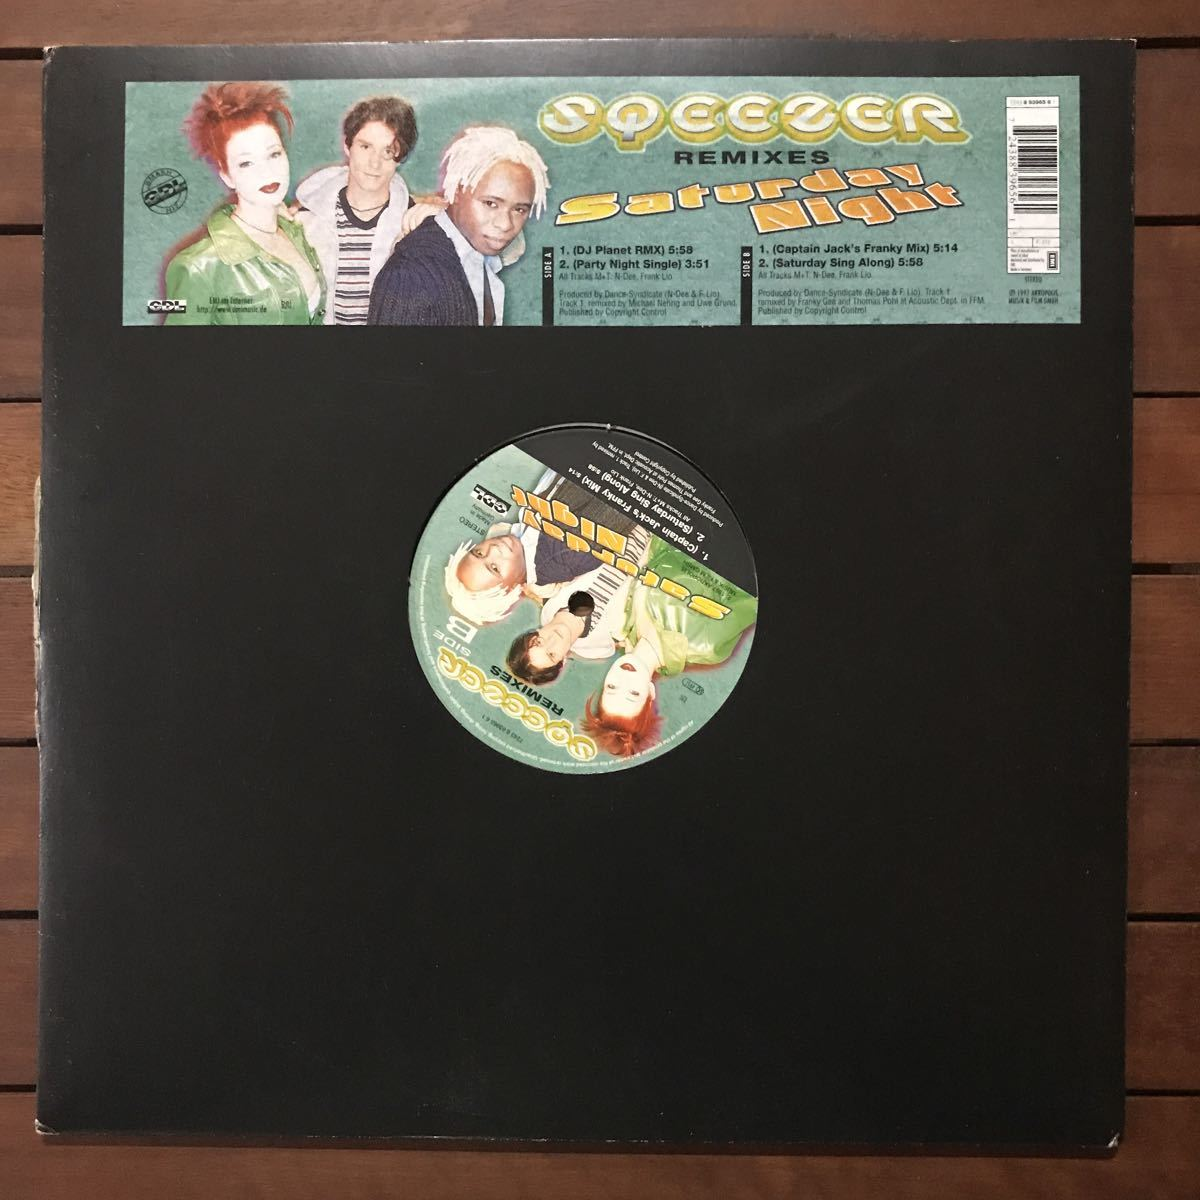 ●【r&b】Sqeezer / Saturday Night (Remixes)[12inch]オリジナル盤《3-2-90 9595》